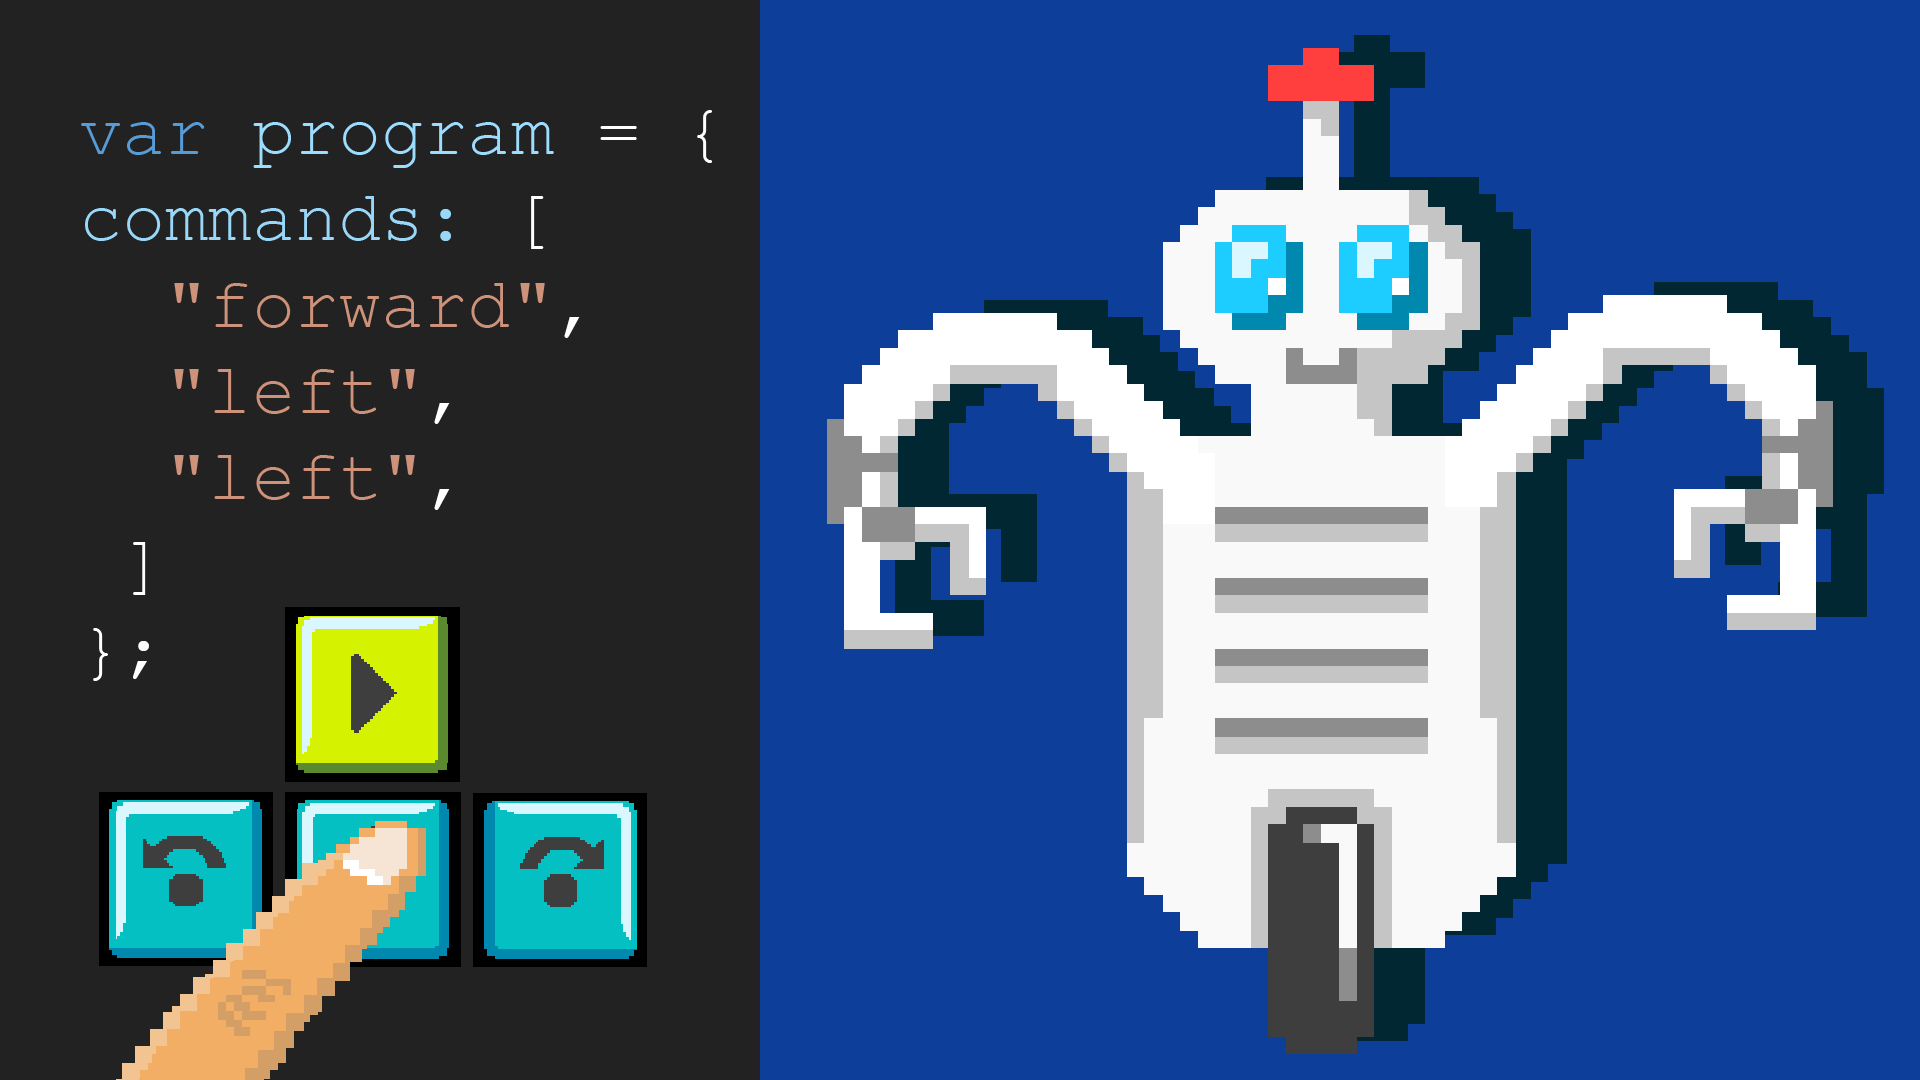 SPIL Styr robotten Roberta og lær hvordan du koder